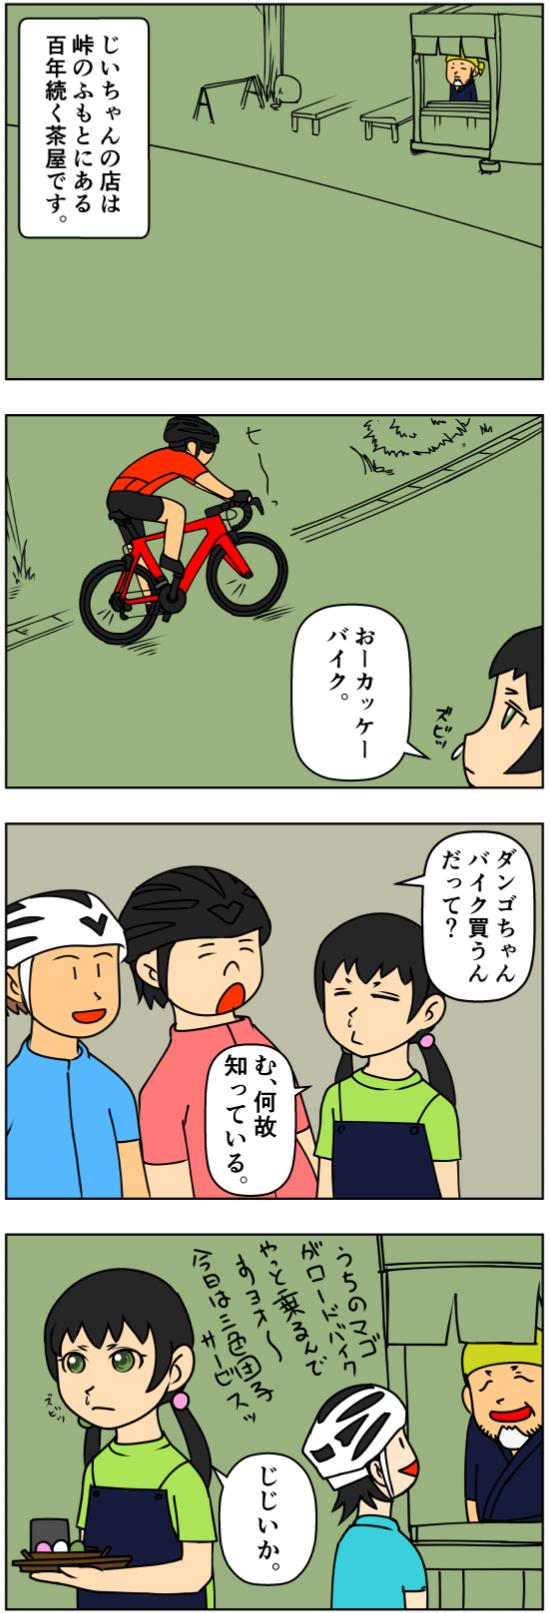 sansyokudanngochan-02-4.jpg